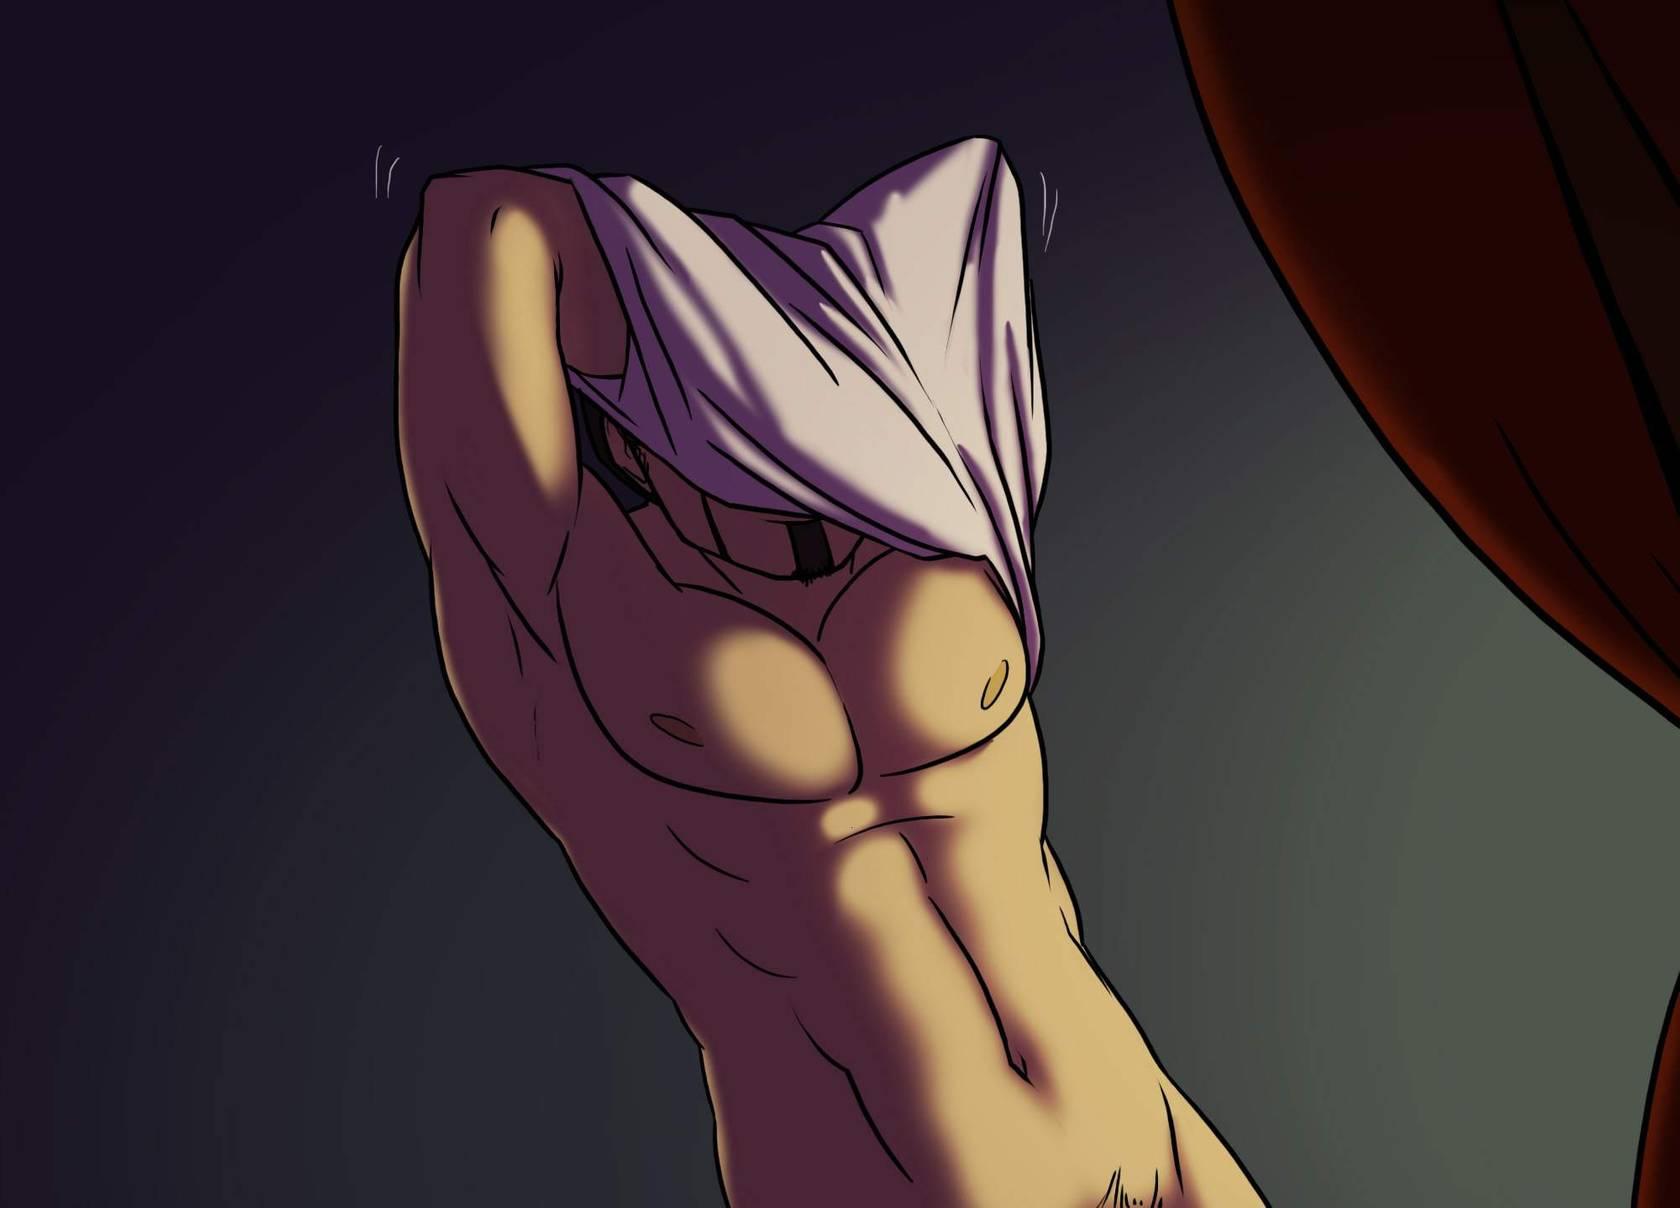 Kobold Adventures! porn comics Oral sex, Blowjob, Creampie, Cum Shots, Cum Swallow, cunnilingus, fingering, Furry, Group Sex, Rape, Straight